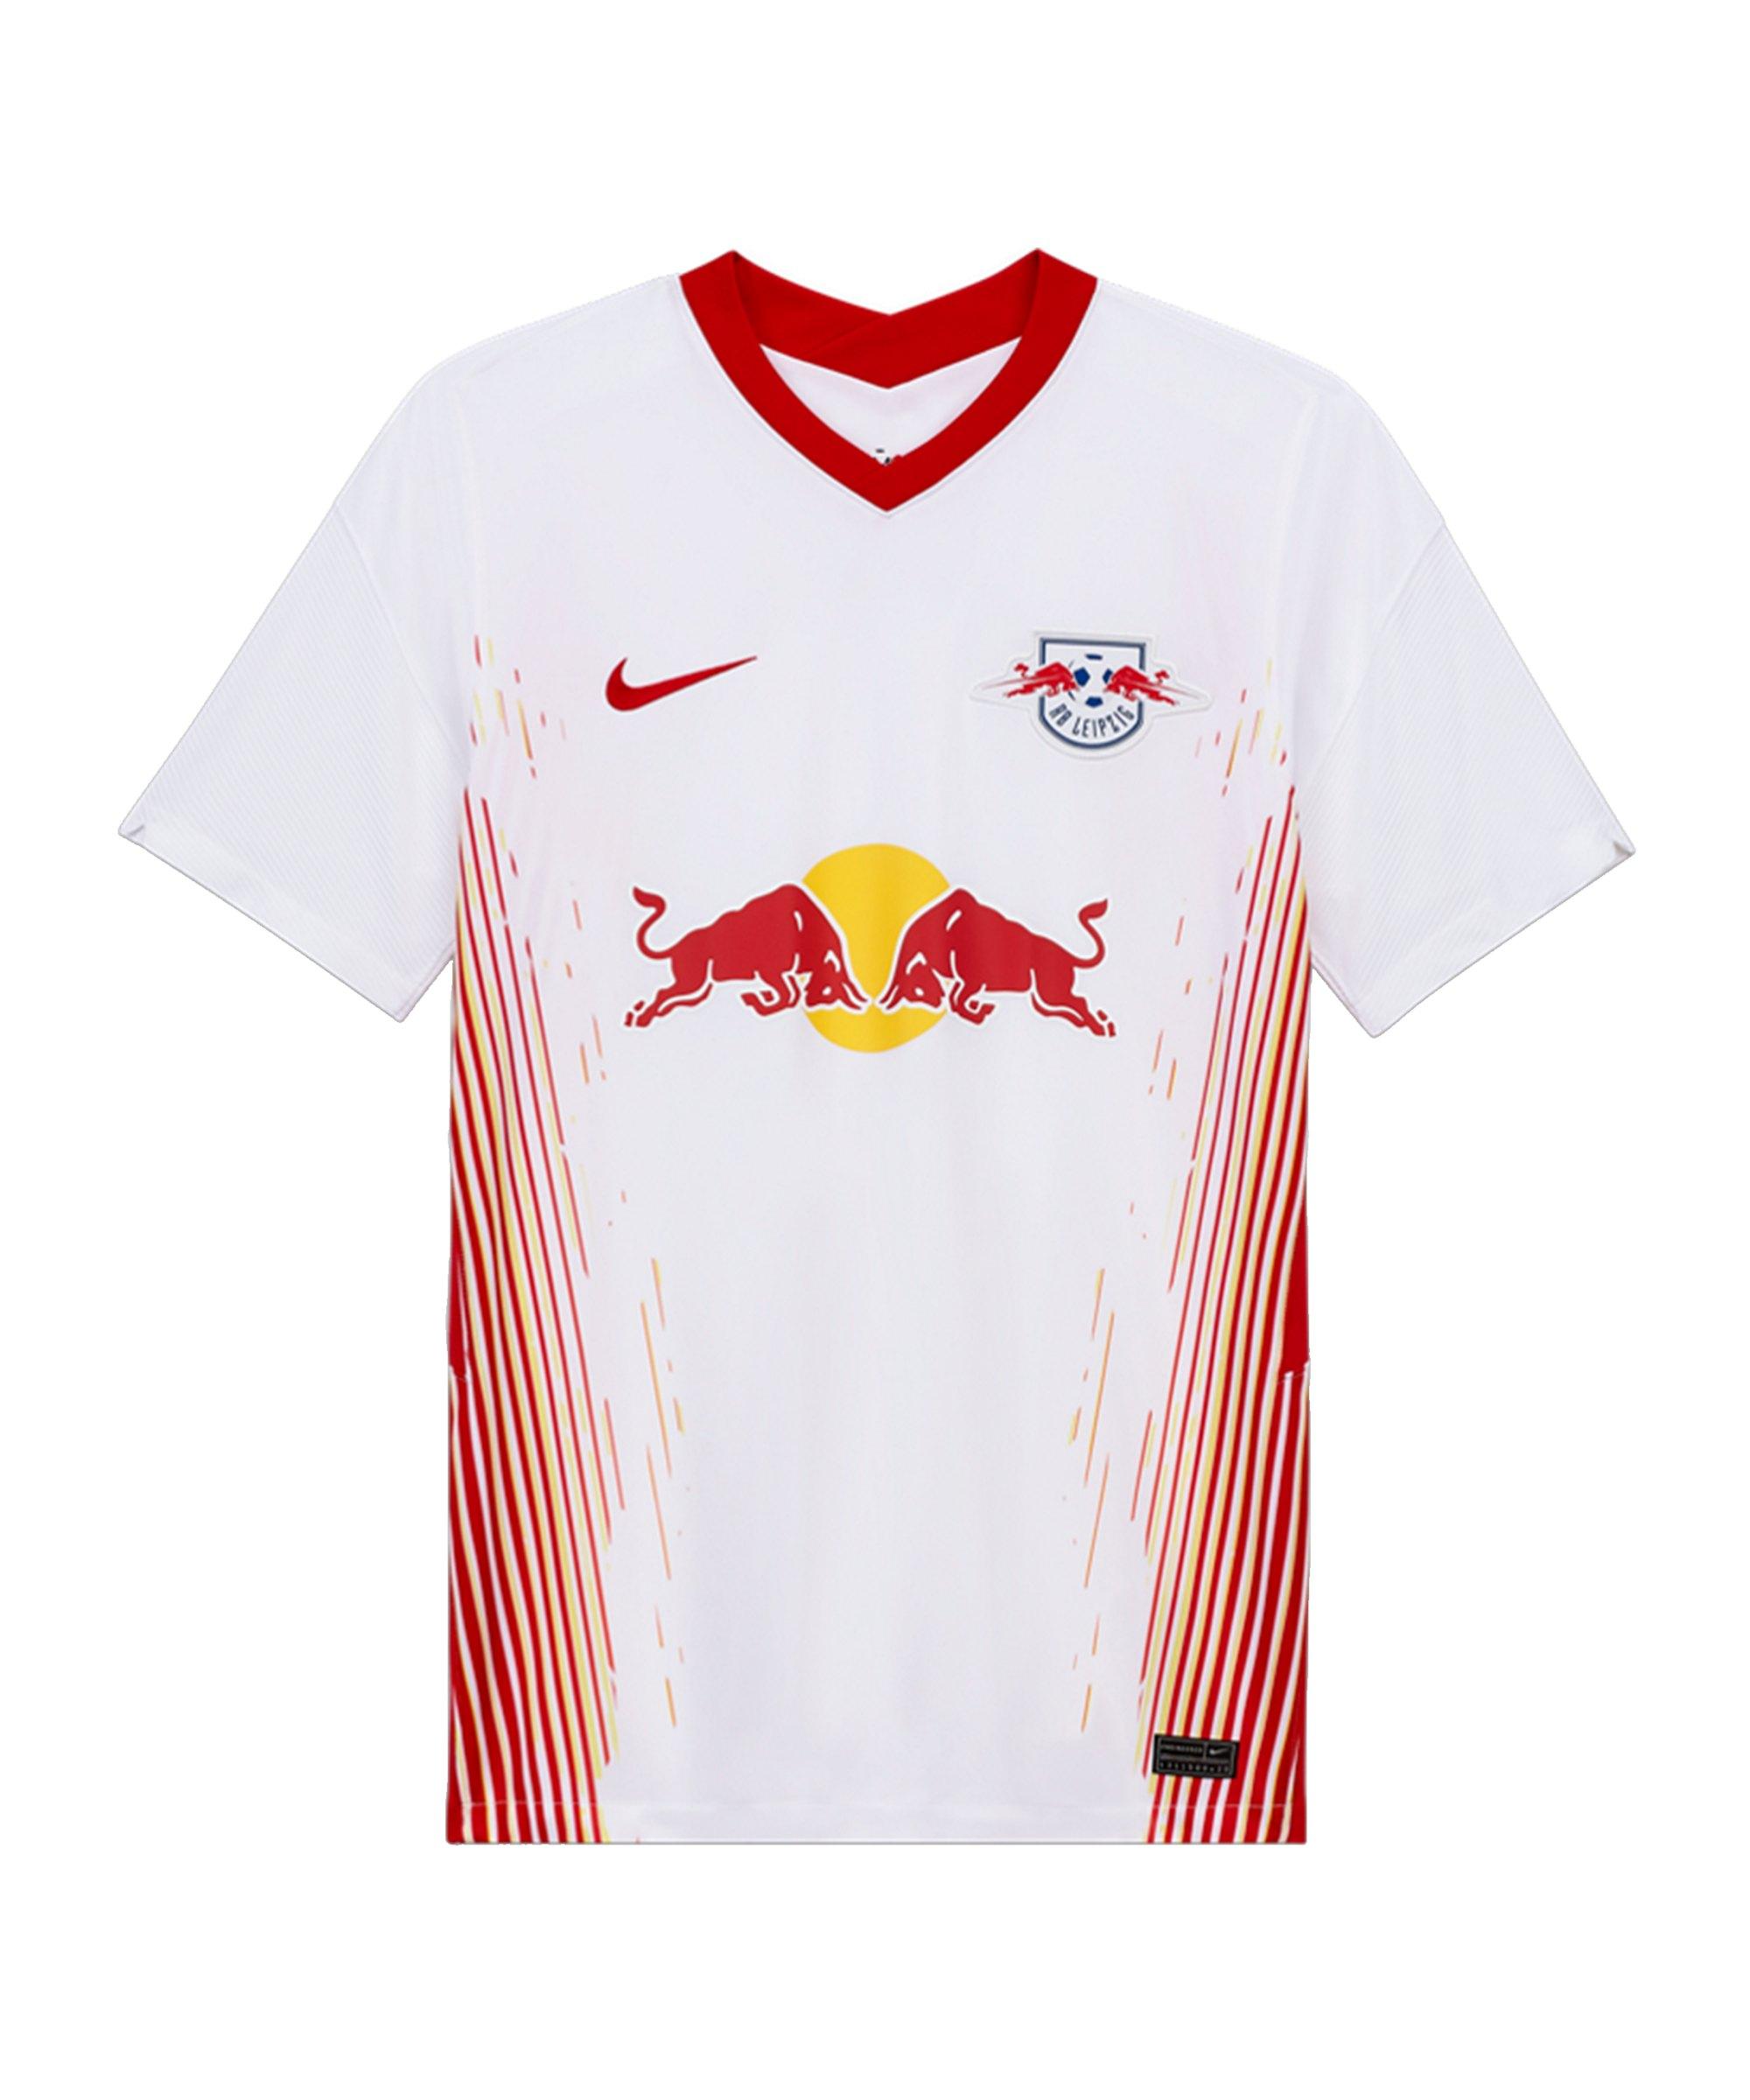 Nike RB Leipzig Trikot Home 2020/2021 Weiss F101 - weiss